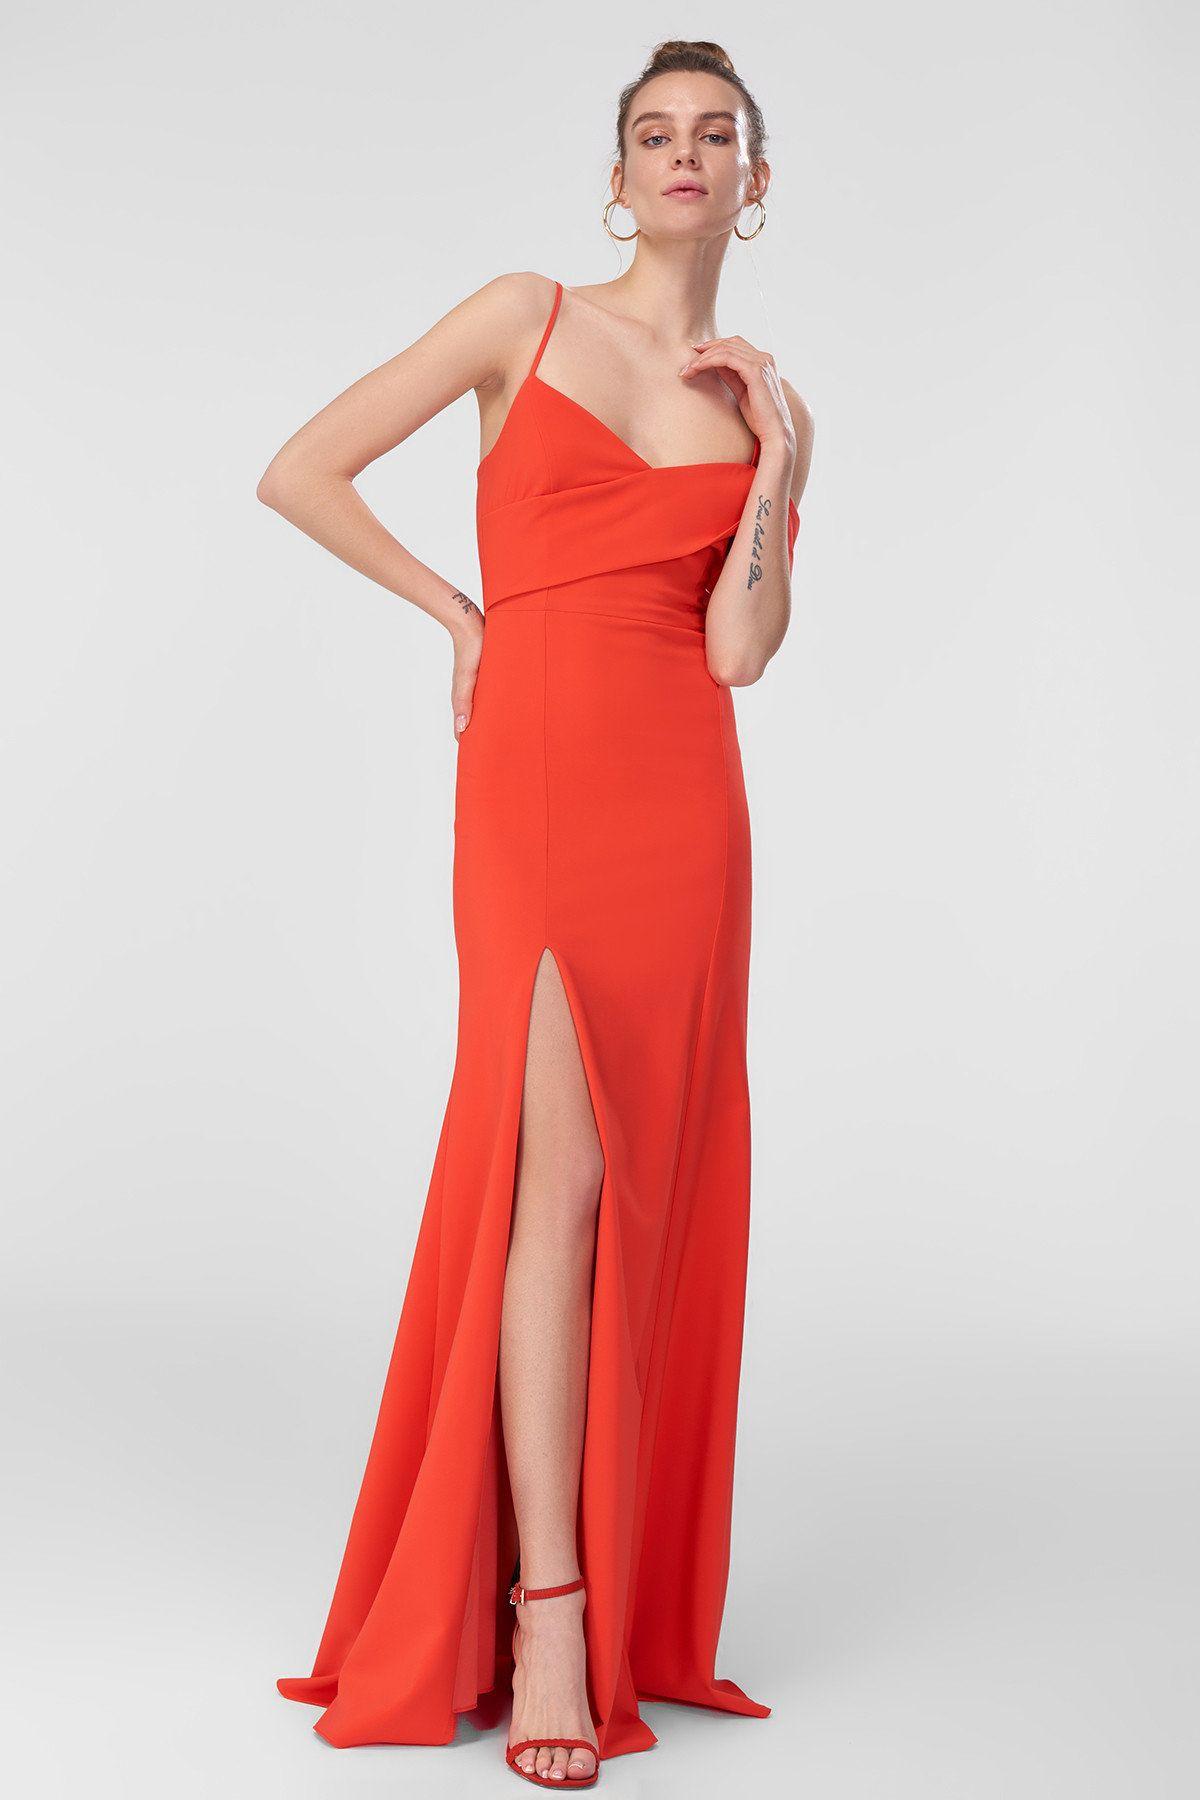 Nar Cicegi Tek Omuz Abiye Elbise Trendyolmilla Trendyol Elbise The Dress Resmi Elbise